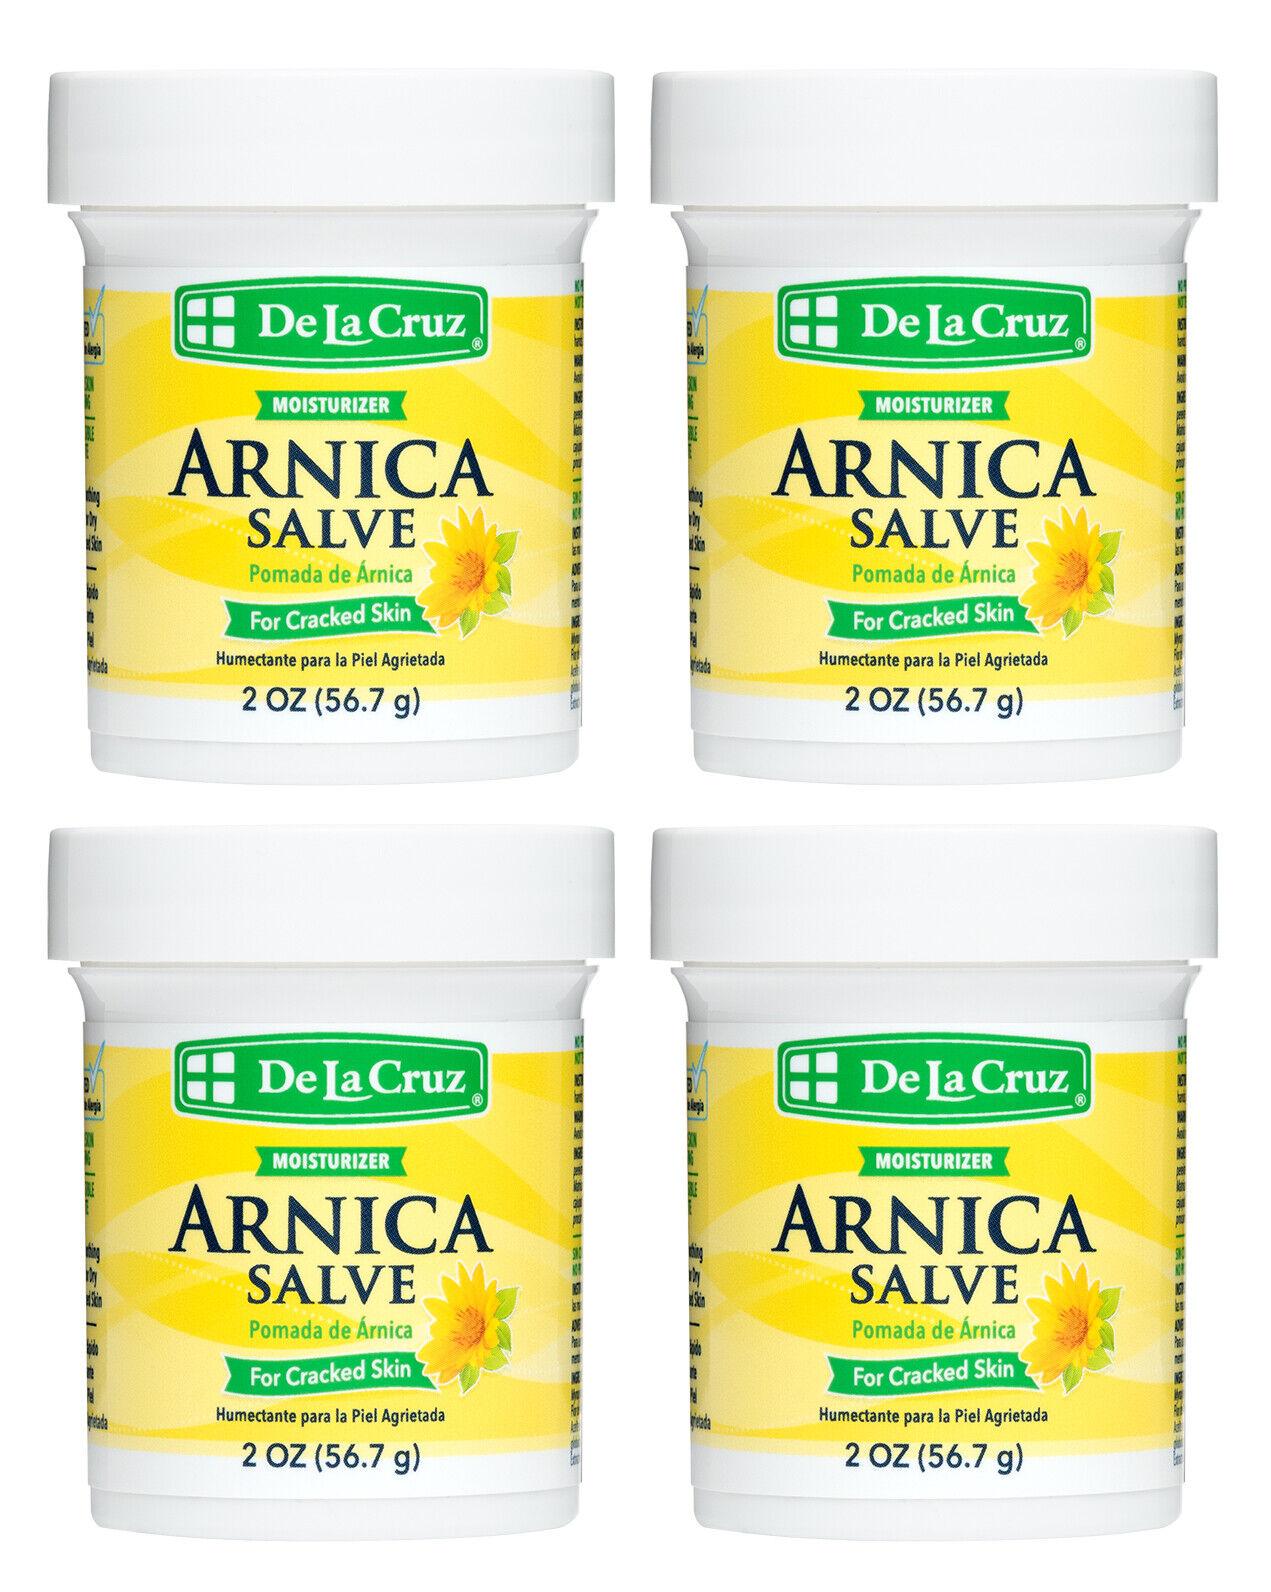 De La Cruz Arnica Salve for Cracked Skin 2 OZ - (4 JARS) / Made in USA Exp 5/24